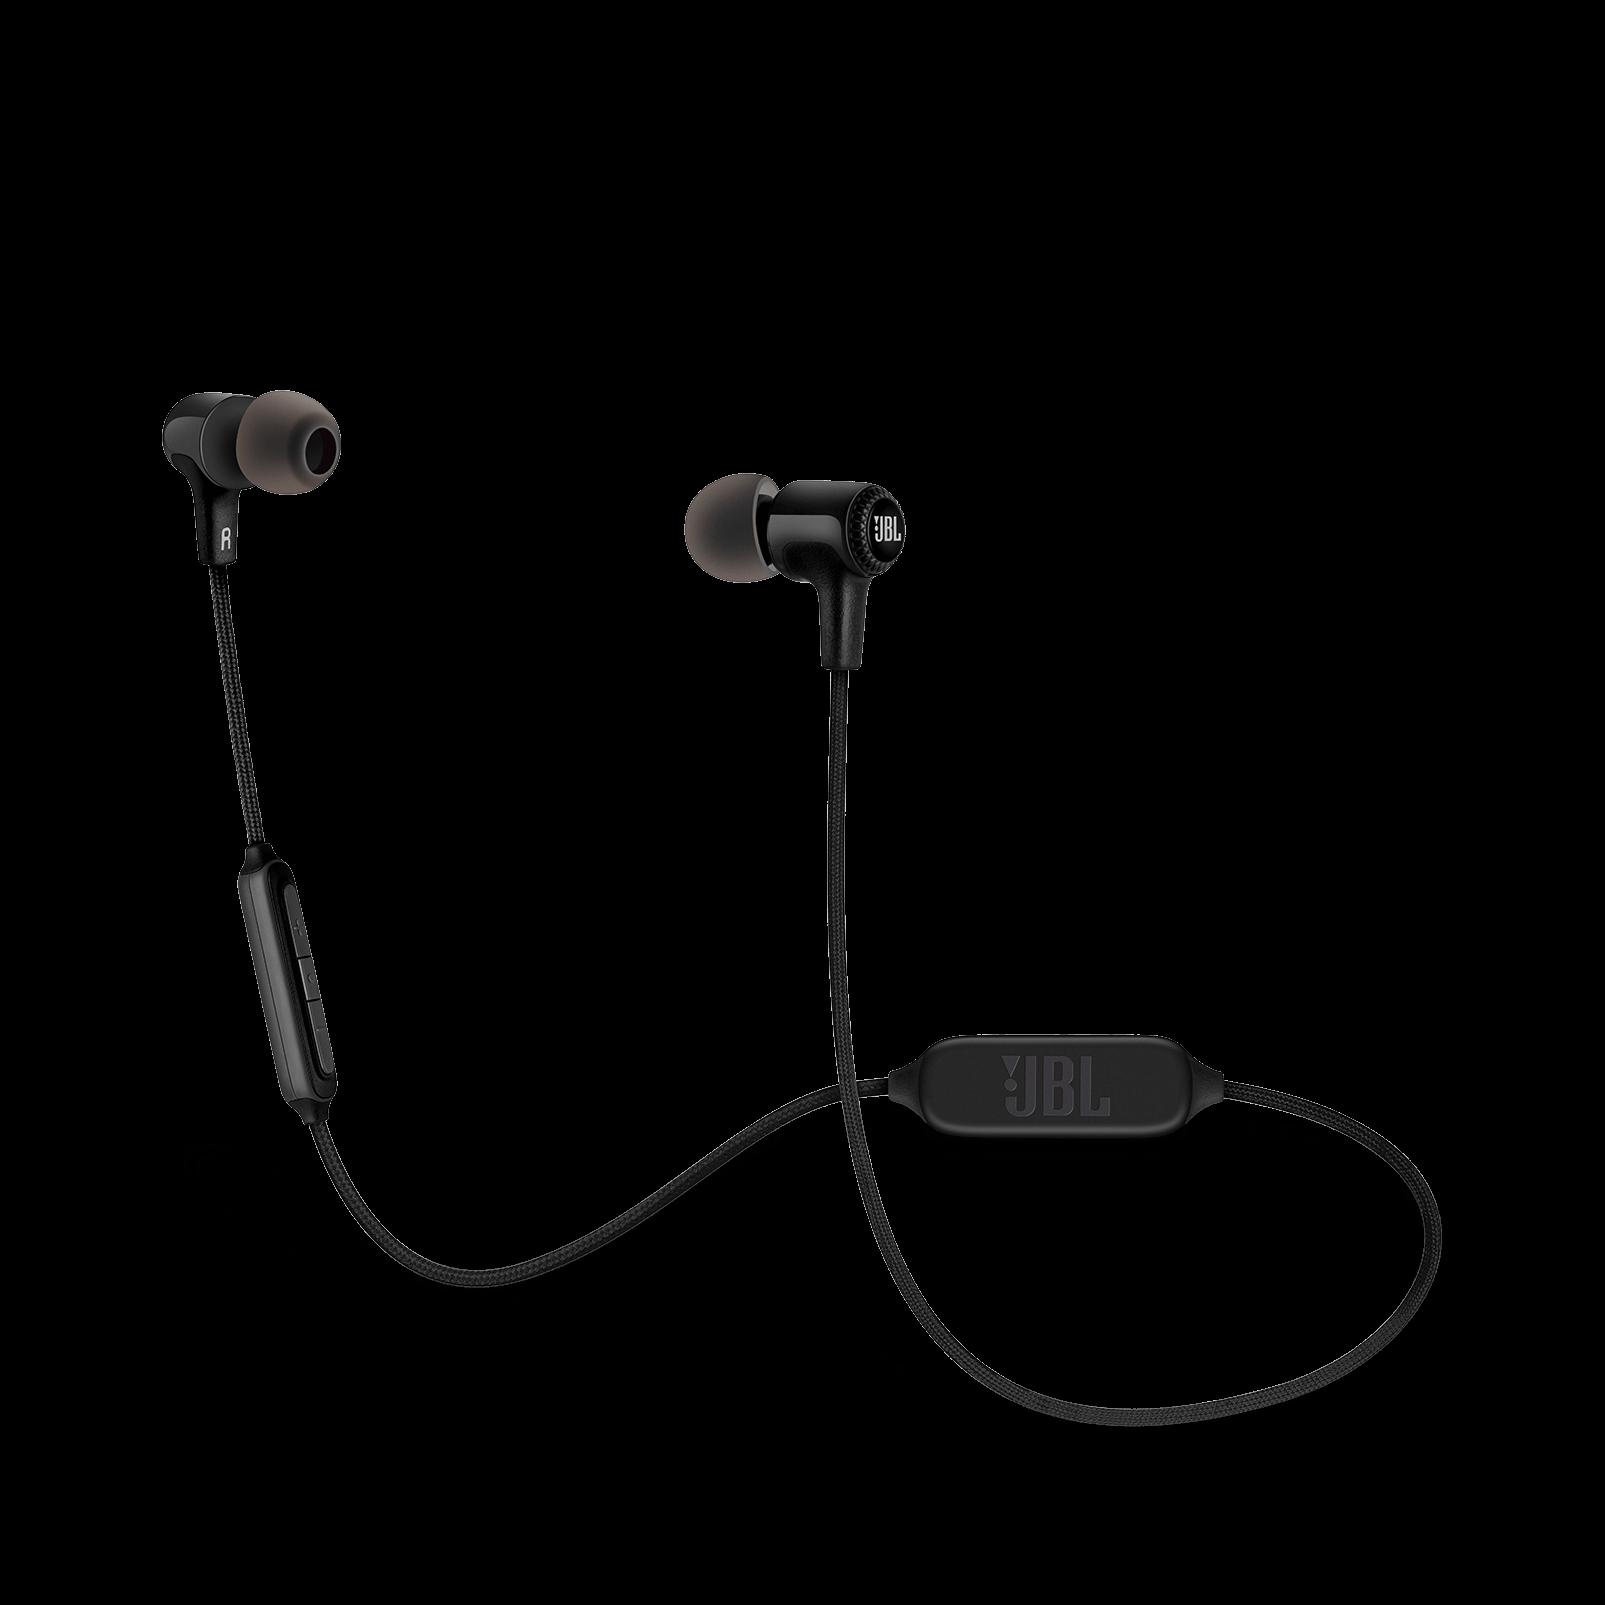 Fone De Ouvido JBL E25BT com microfone - Preto